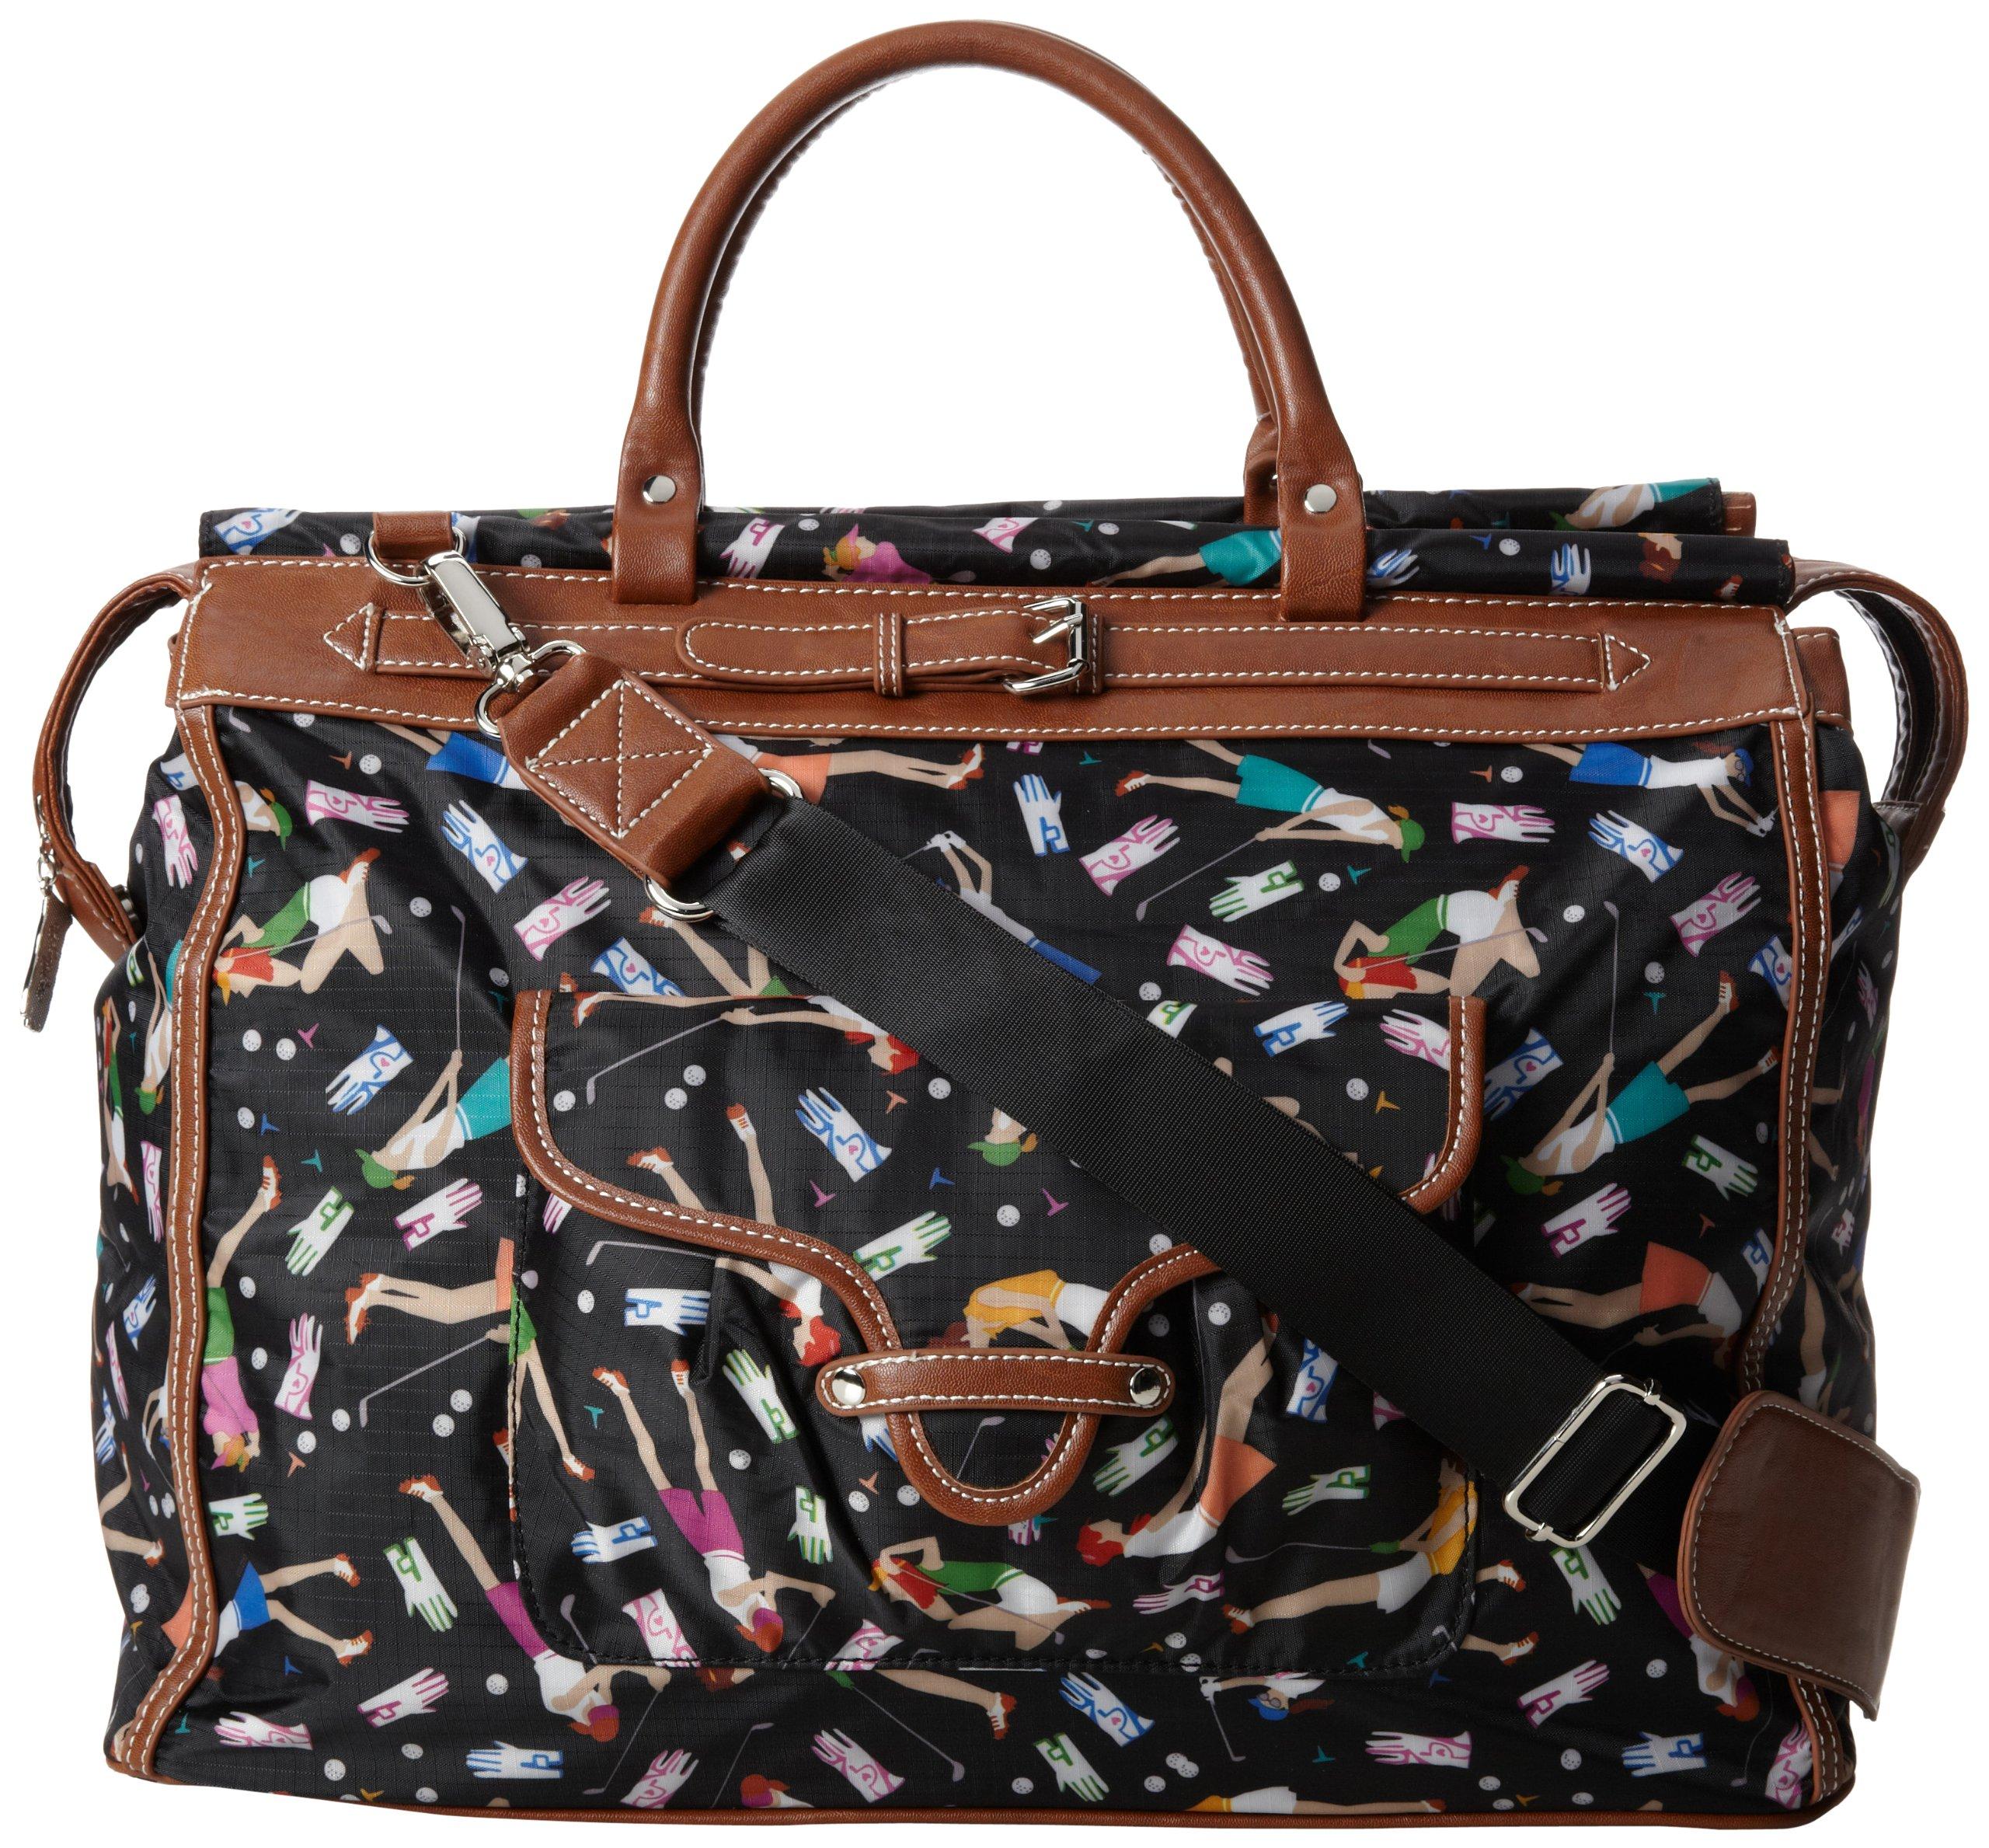 Sydney Love Lady Golf Getaway Bag Carry On,Multi,One Size